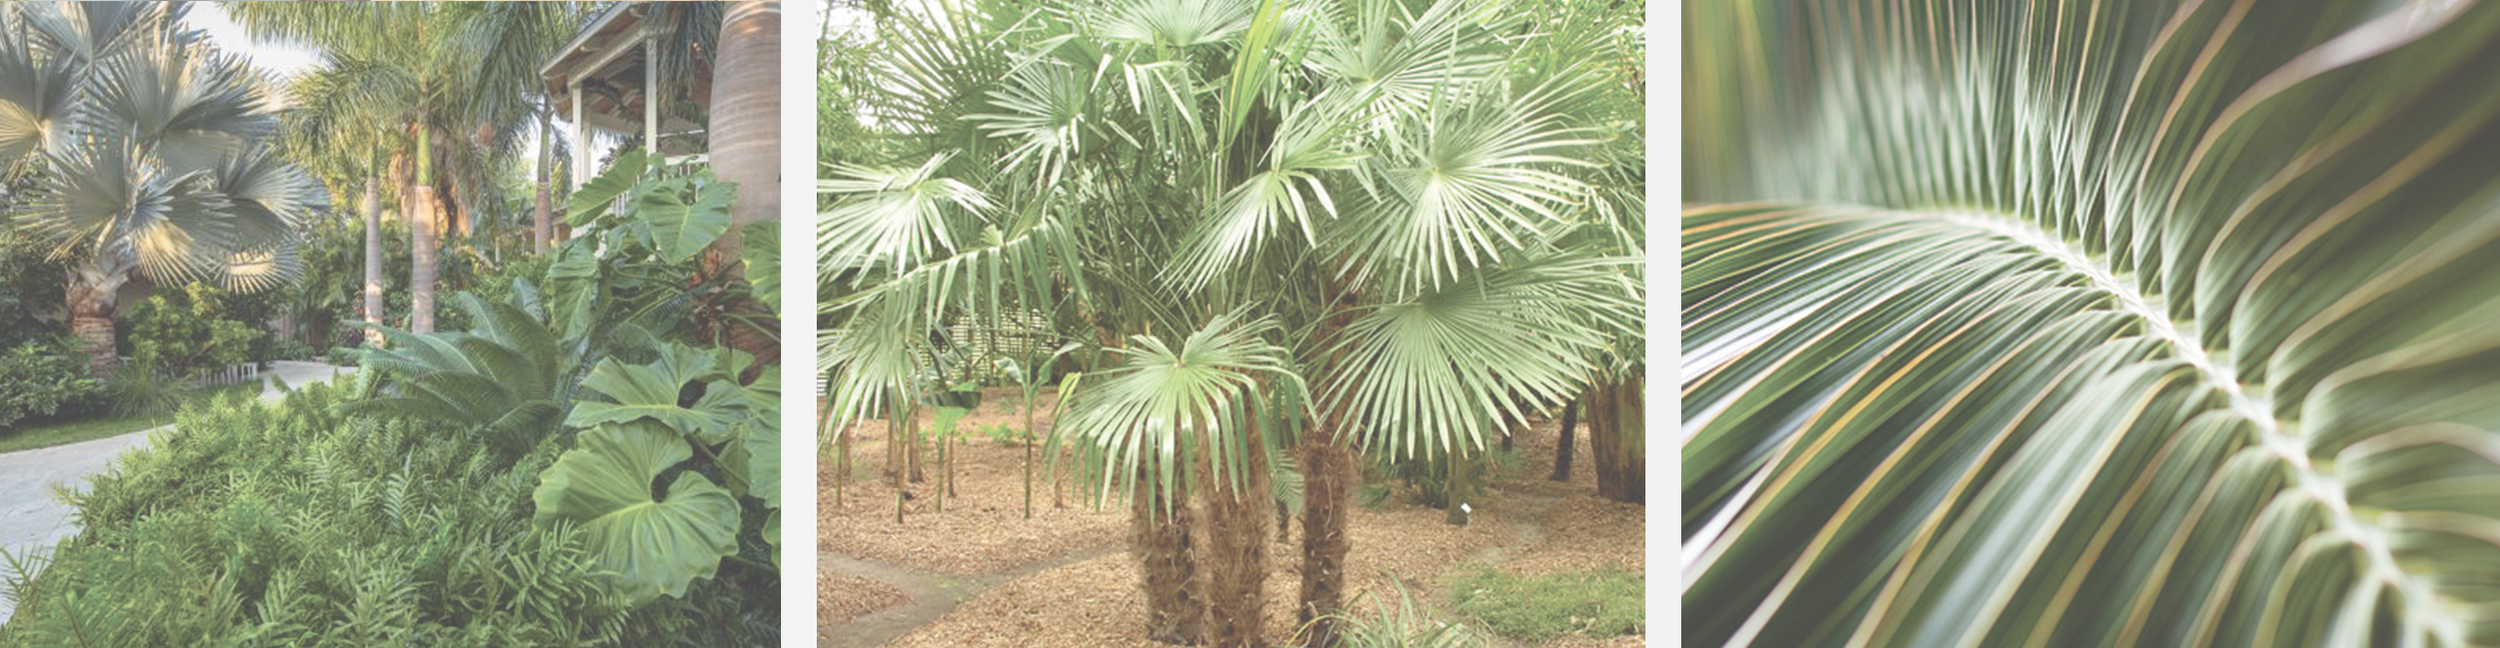 Windmill Palm |  Trachycarpus Fortunei